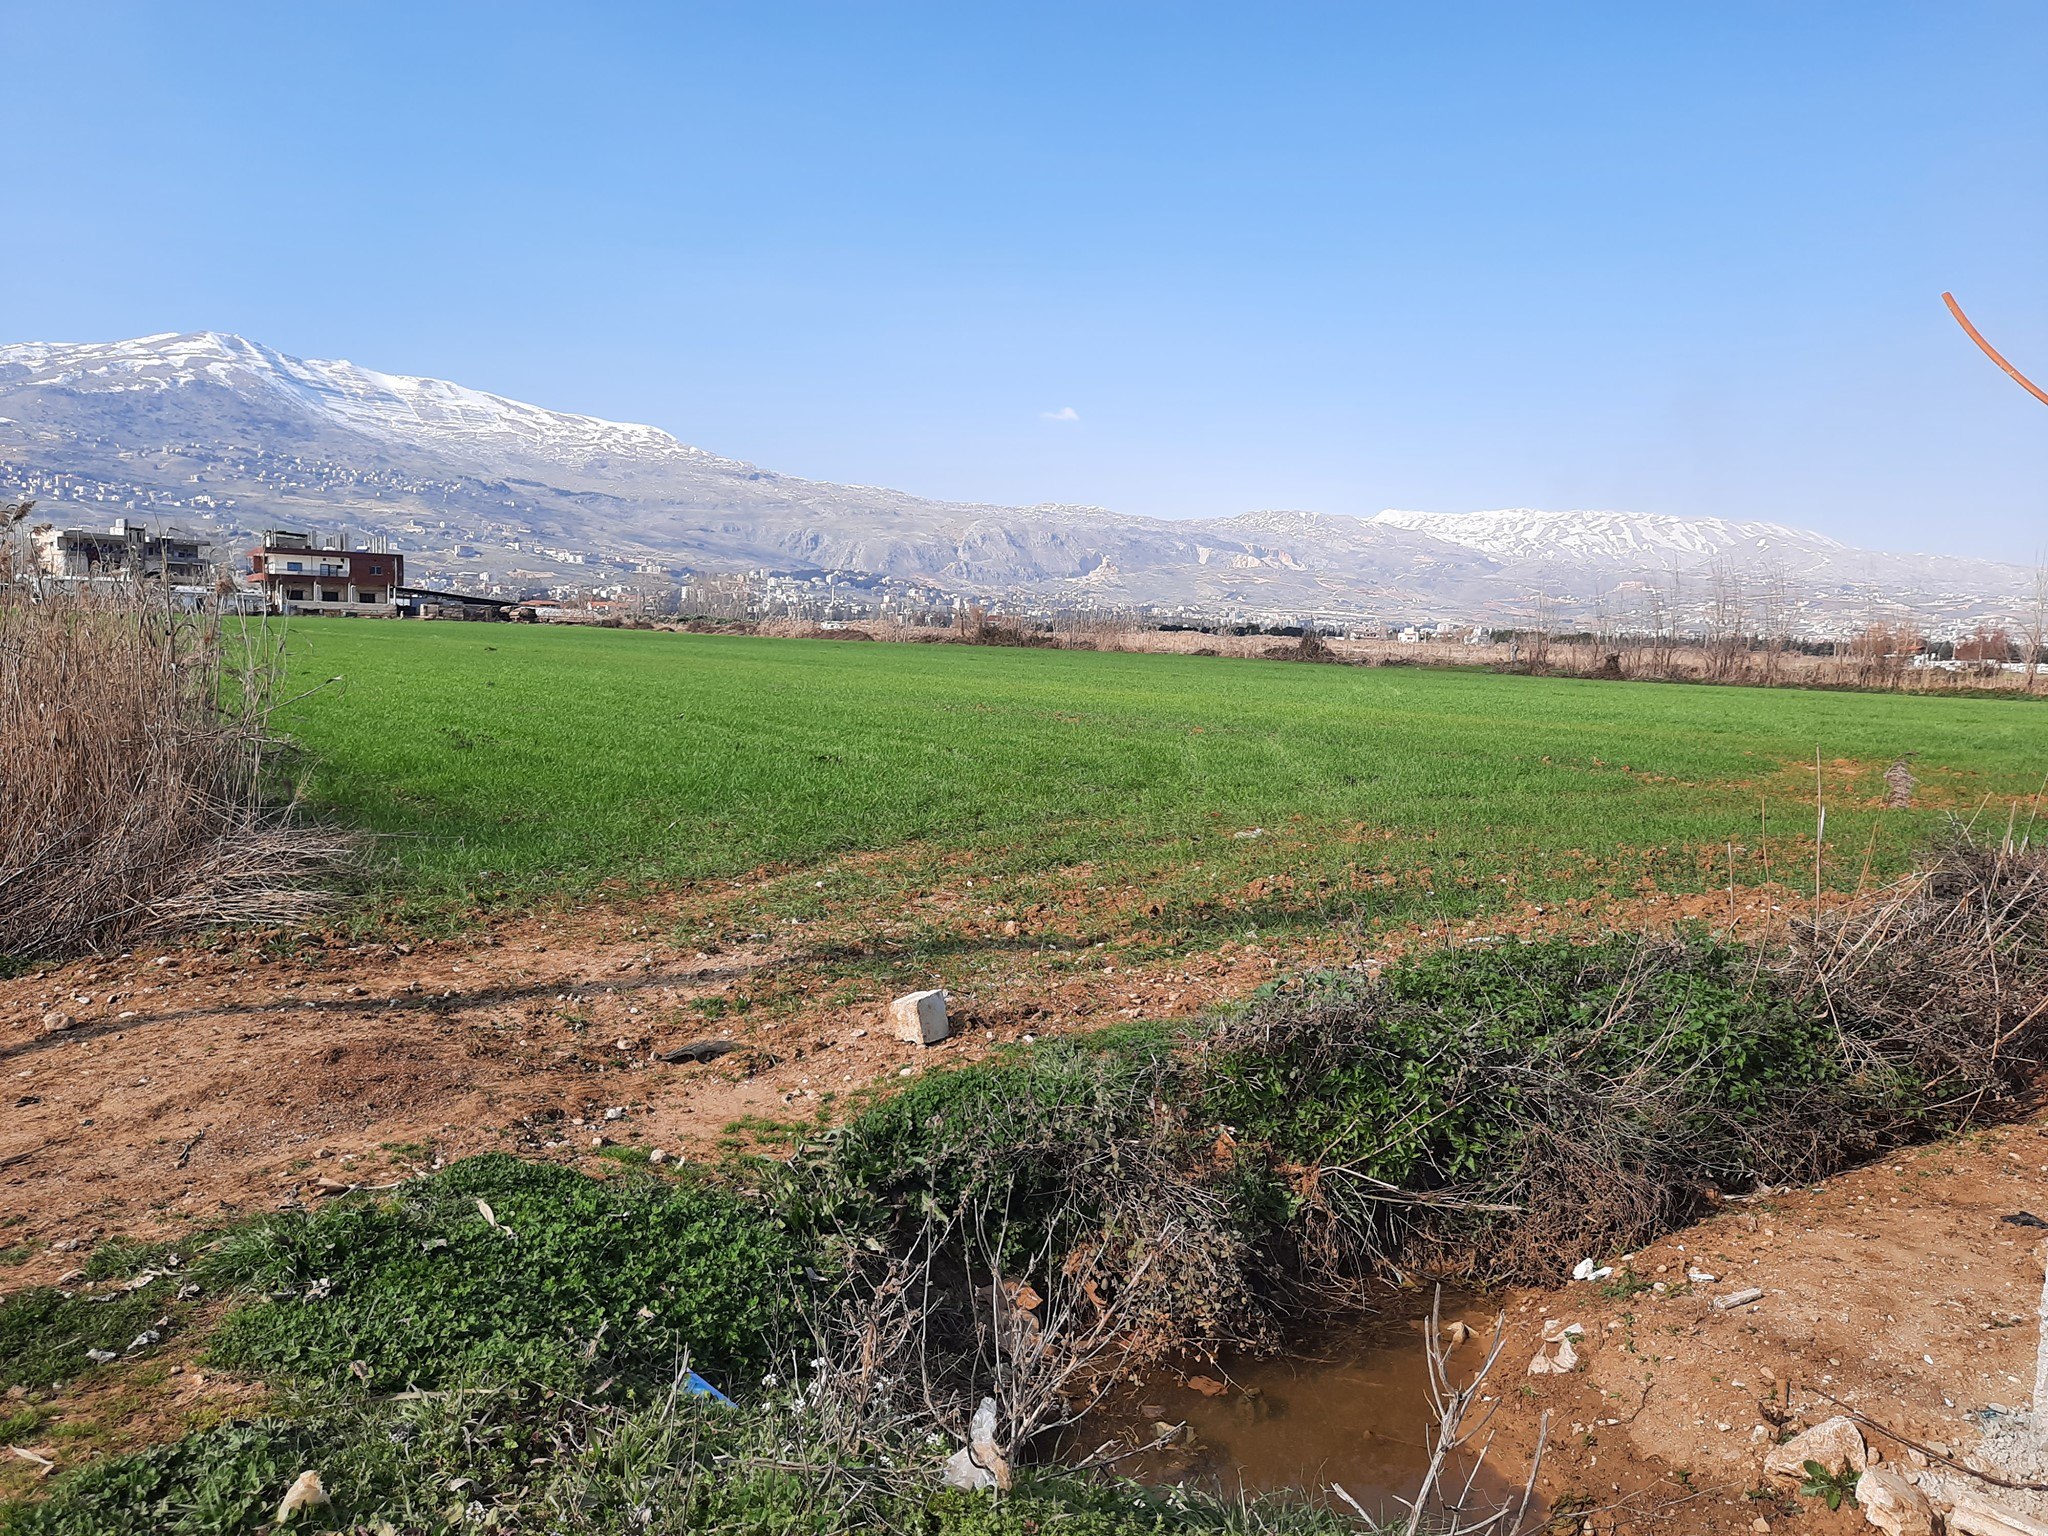 Horizons International buys farmland in Lebanon